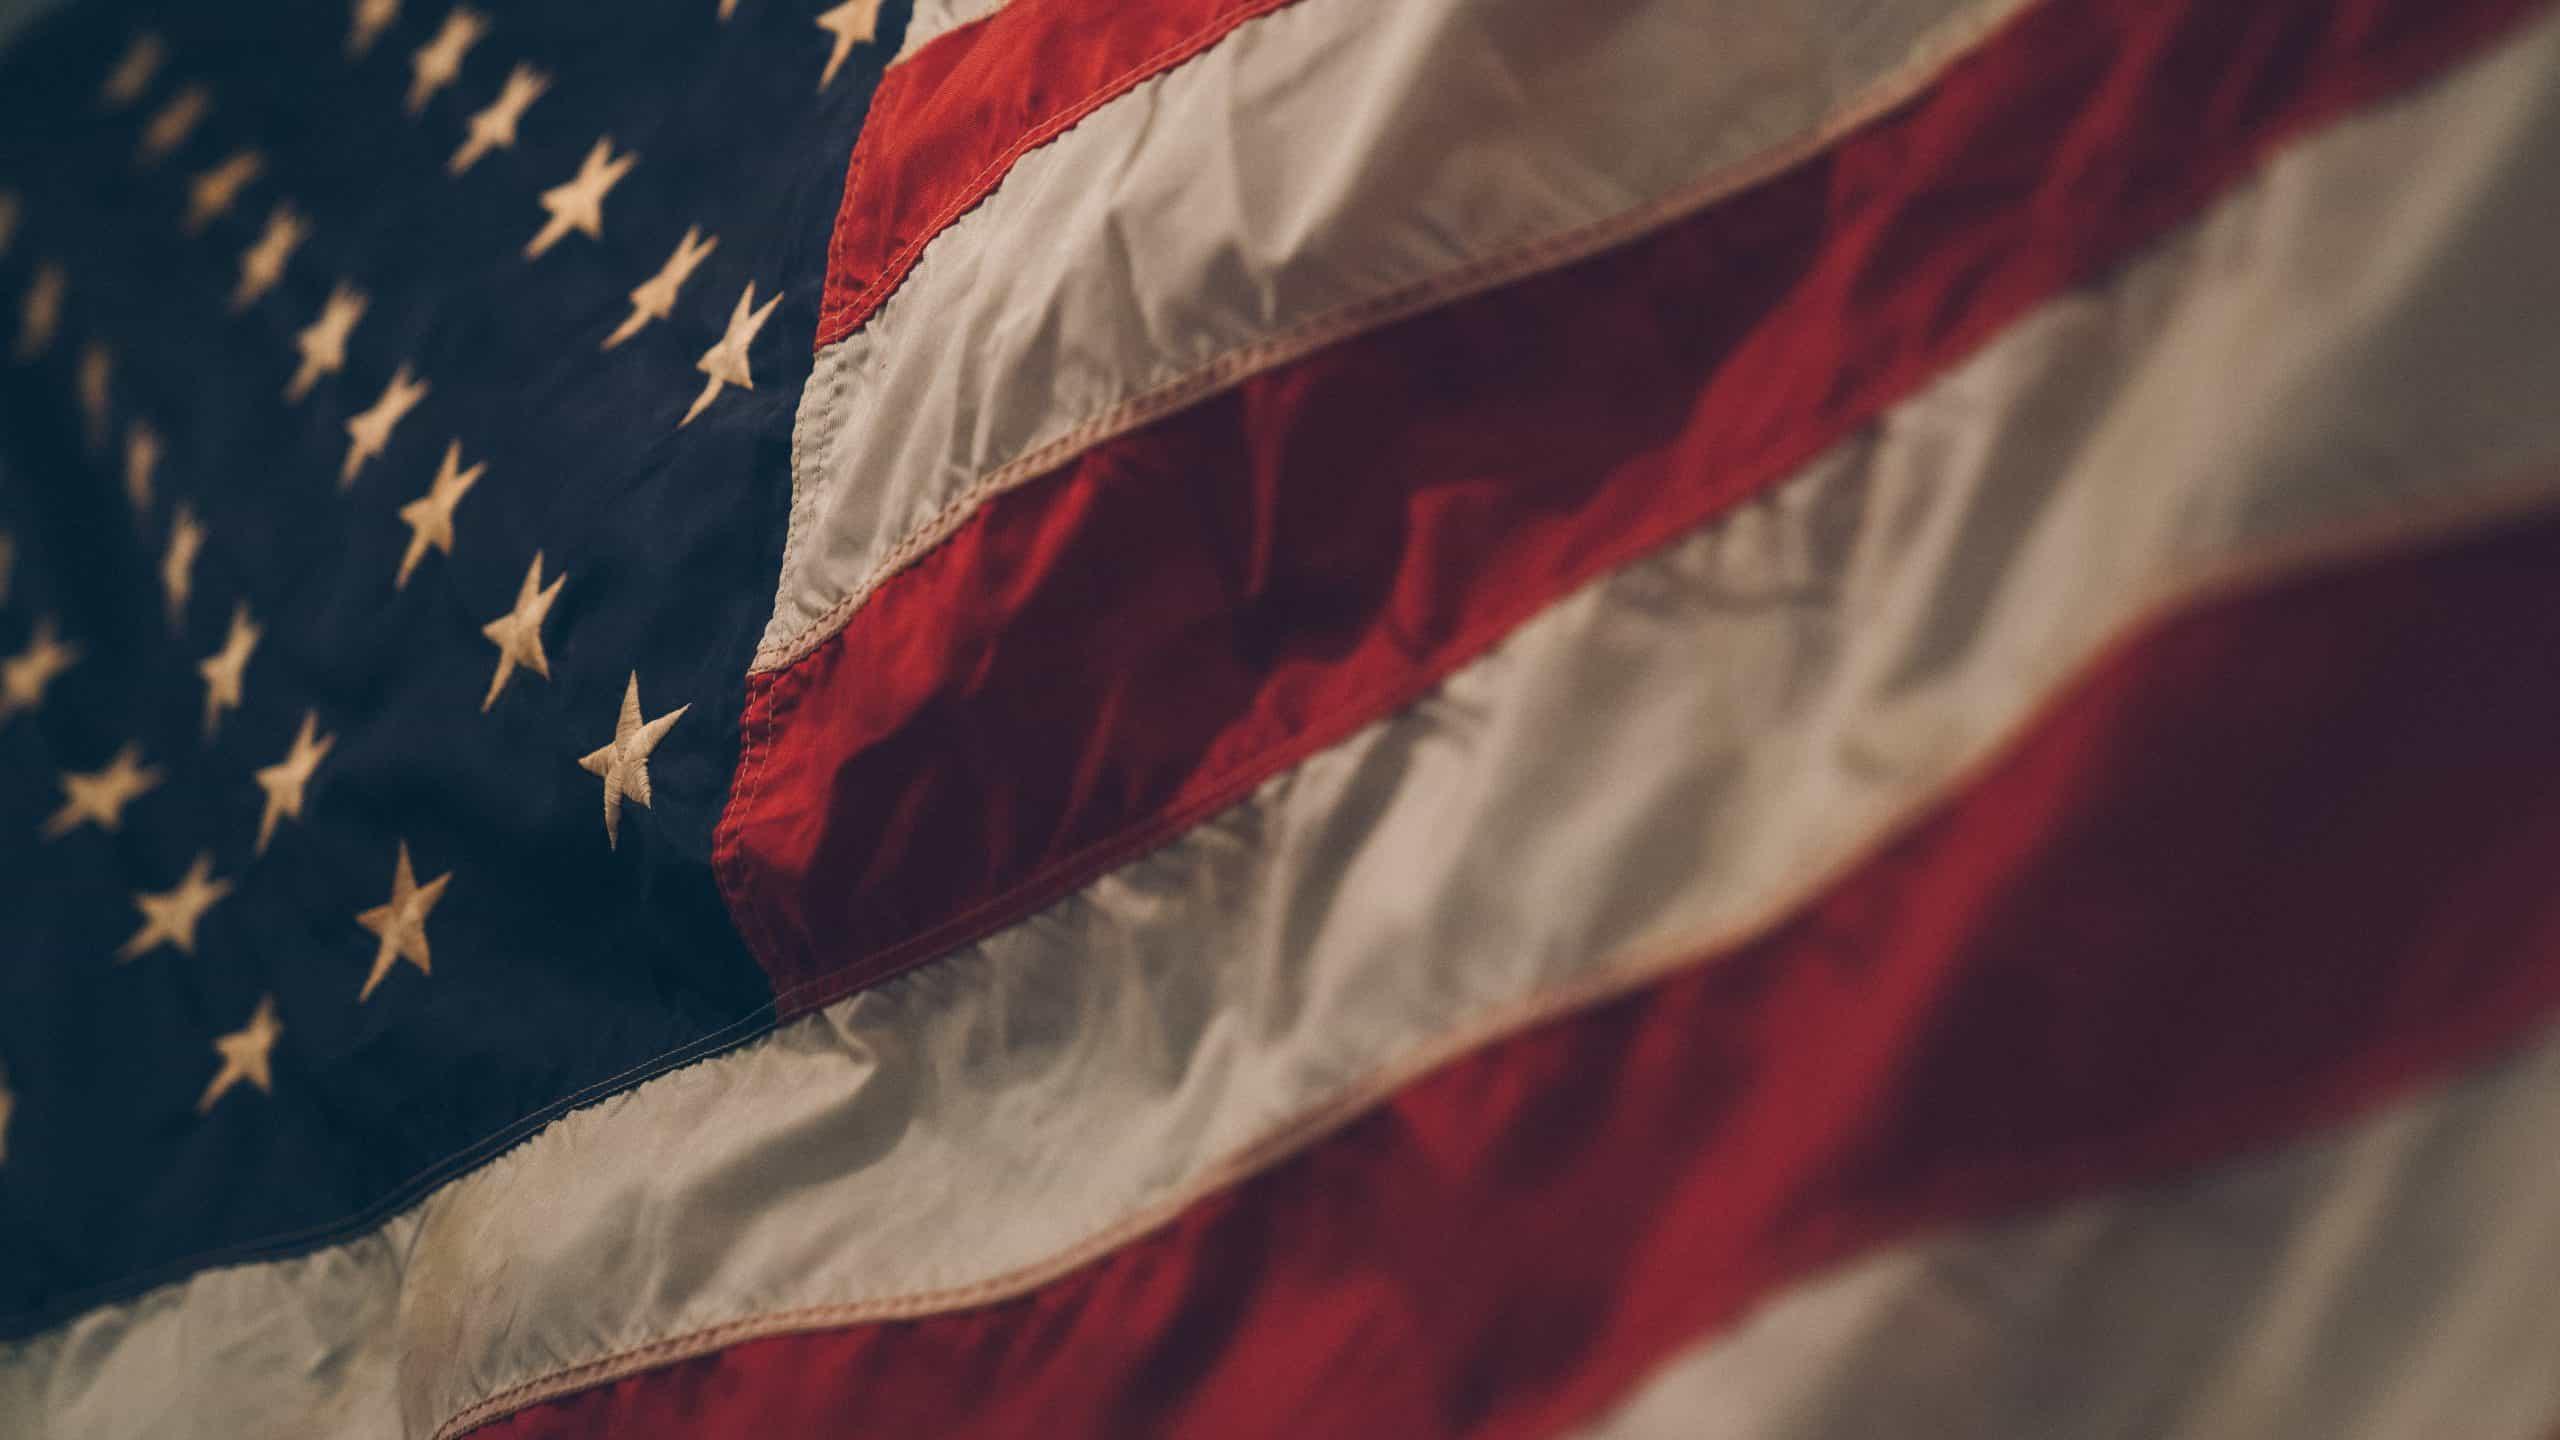 American flag decor